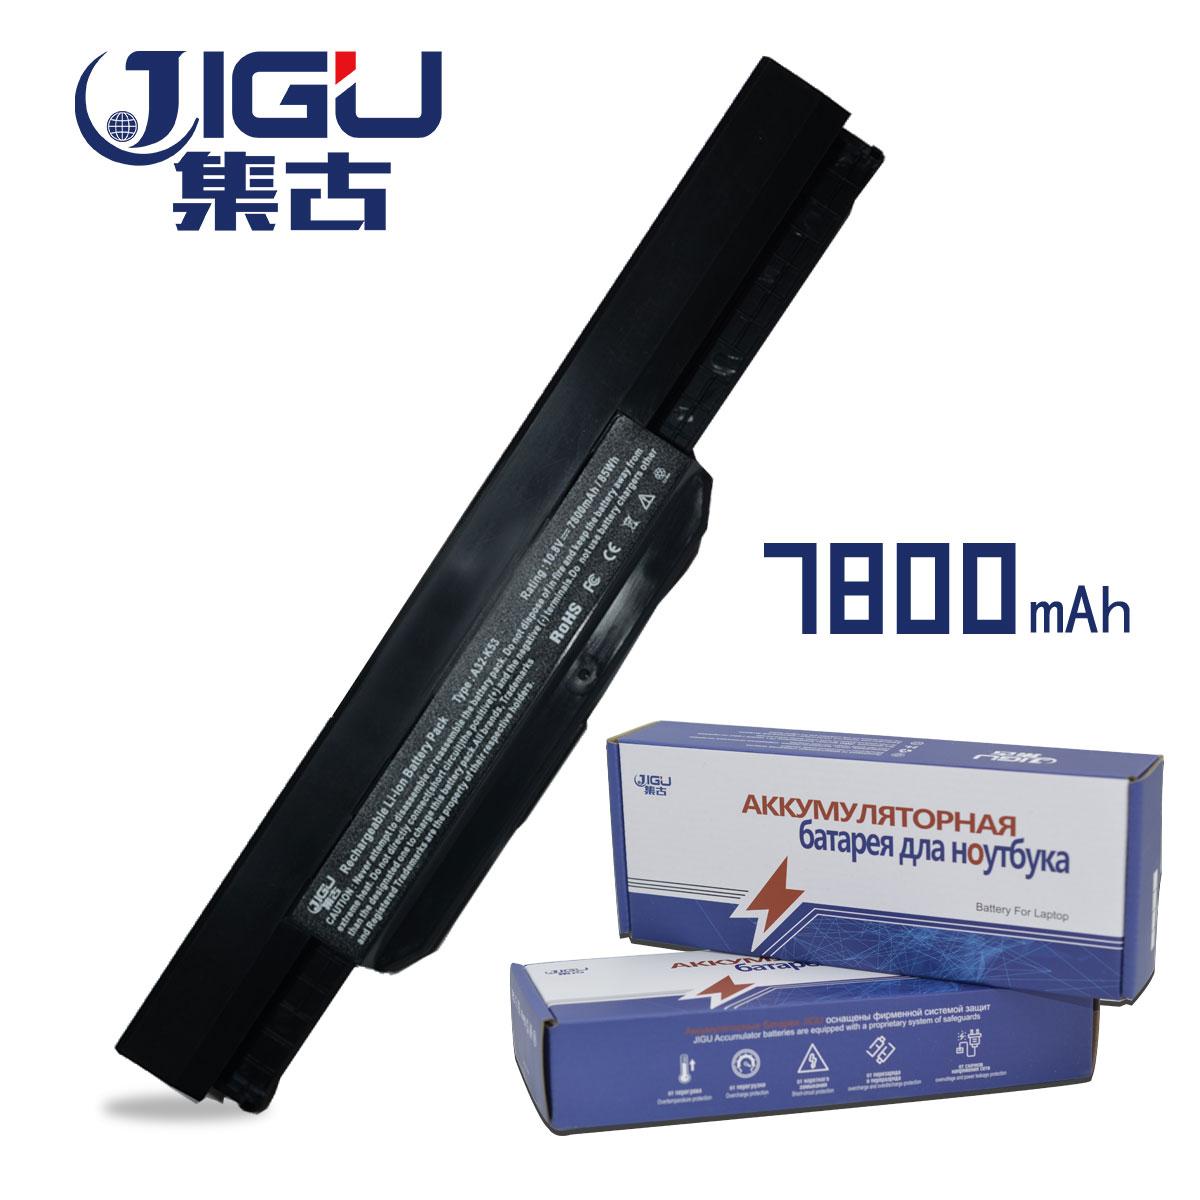 JIGU Battery For Asus A32-k53 A42-K53 A31-K53 A41-K53 A43 A43J A53J A53 K43 K53 K53s X43 X43s X44 X53 X54 X84 X53S